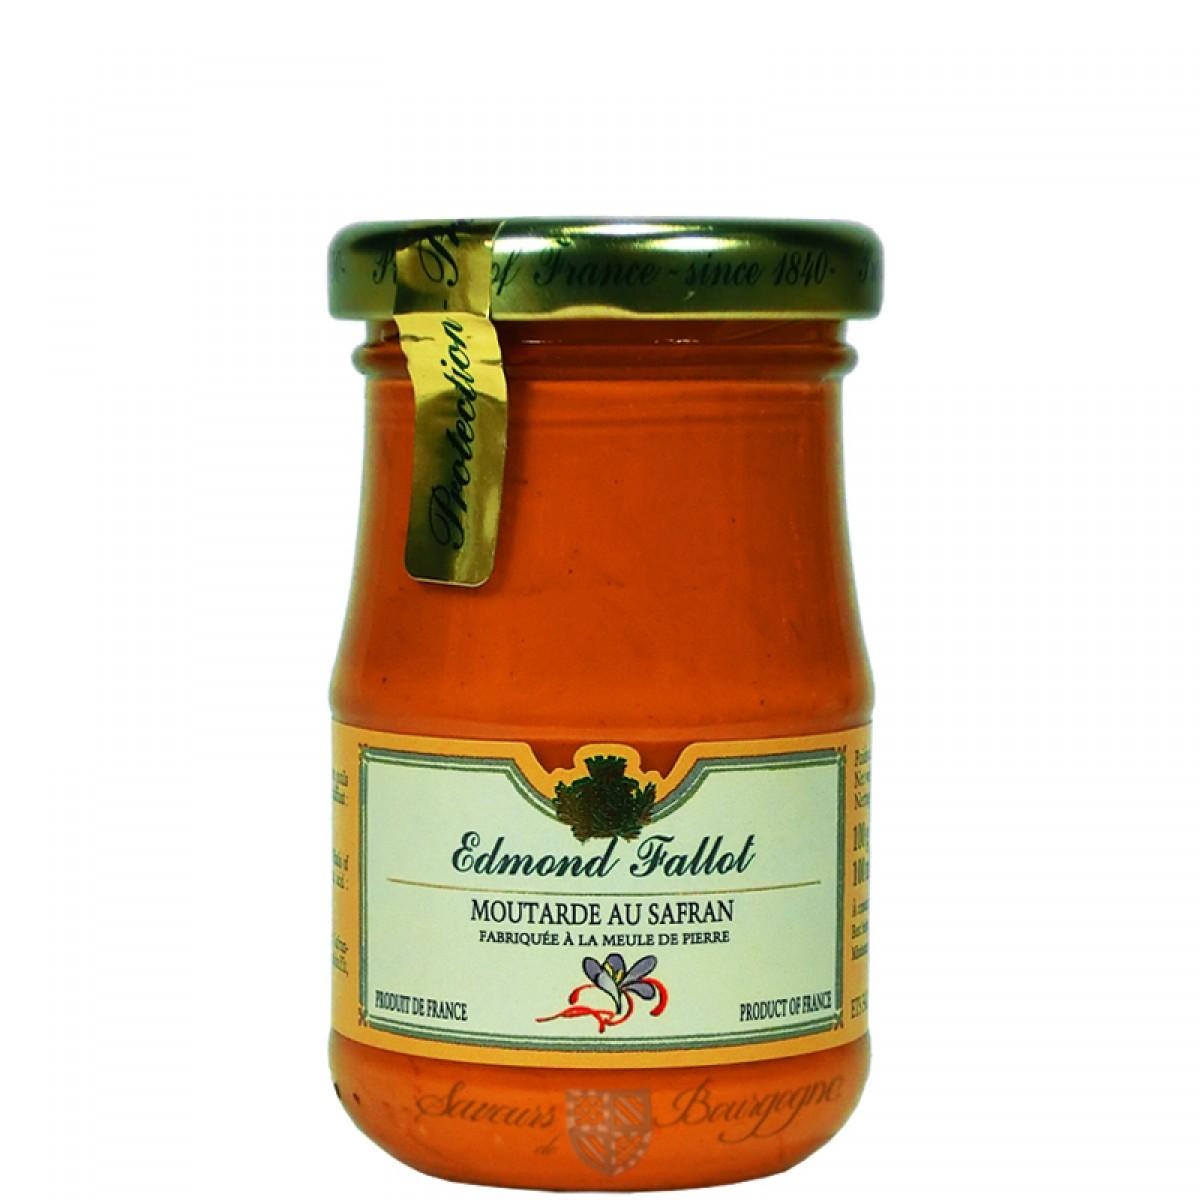 Moutarde au safran 100g fallot saveurs de bourgogne vente de produits du - Moutarde fallot vente ...